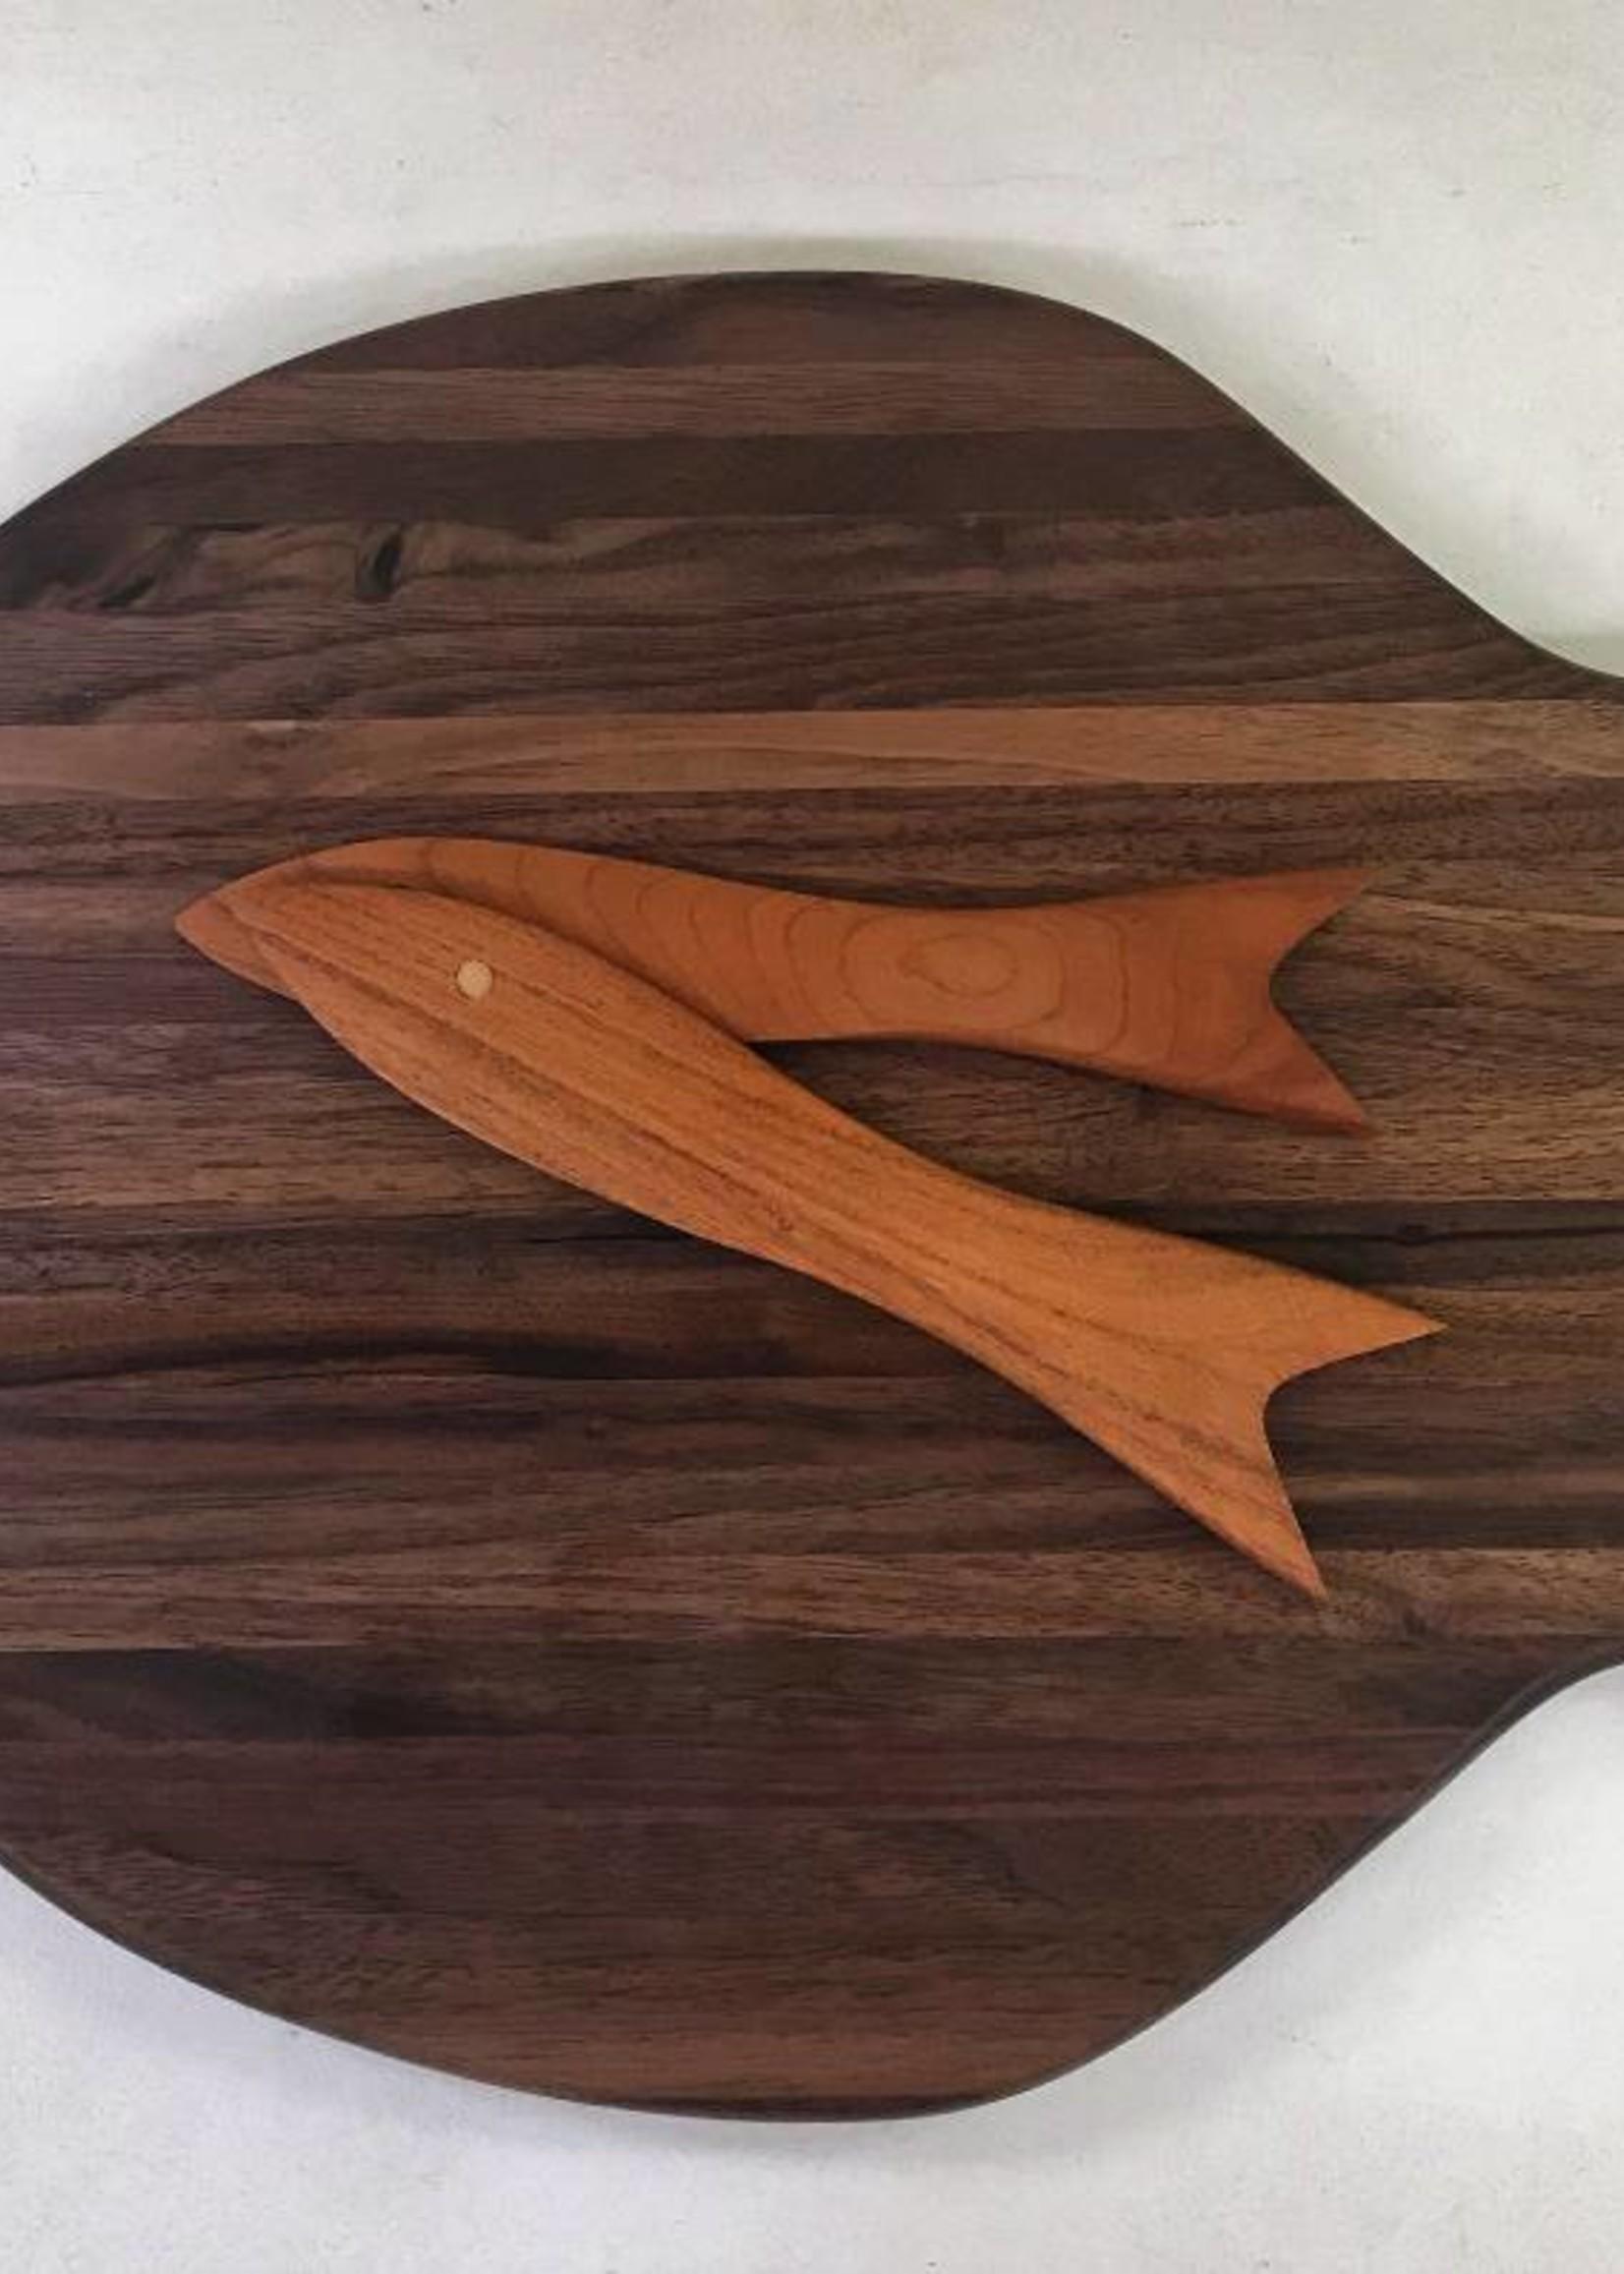 Richard Rose Culinary Fish shaped Cutting Board Walnut